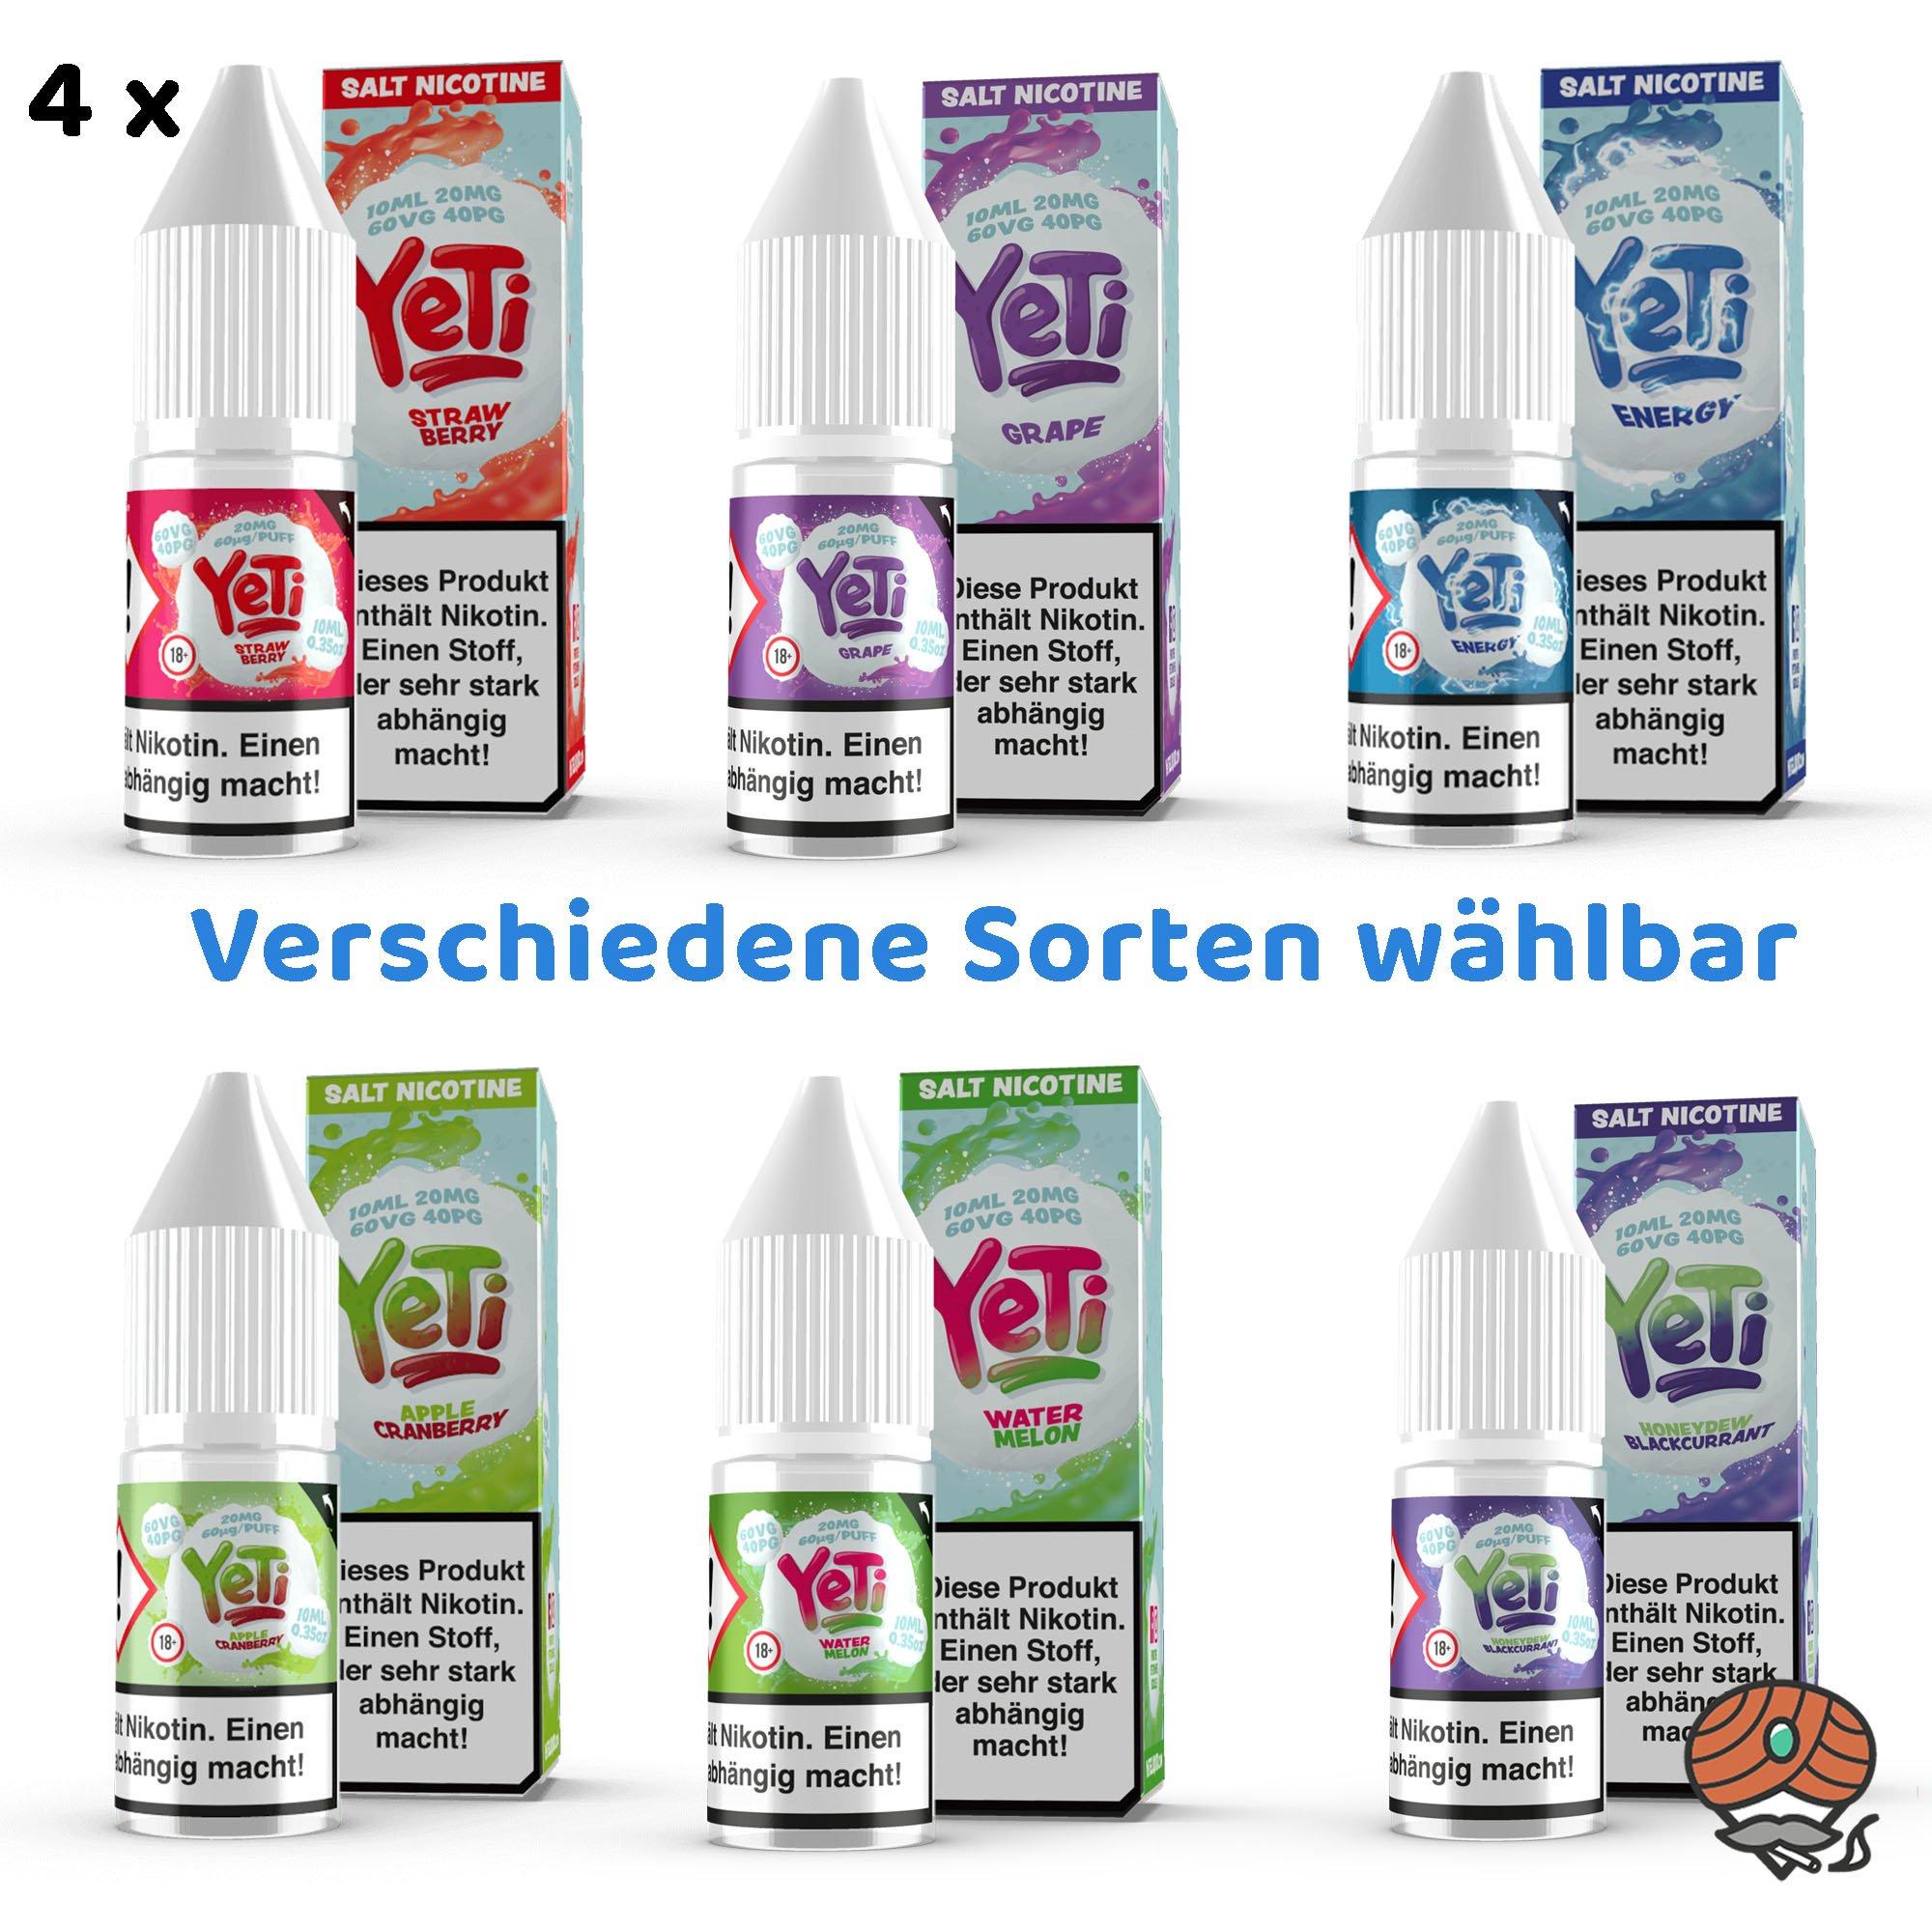 4 x YeTi Nikotinsalz Liquid 10 ml 20 mg/ml Nikotin alle Sorten wählbar